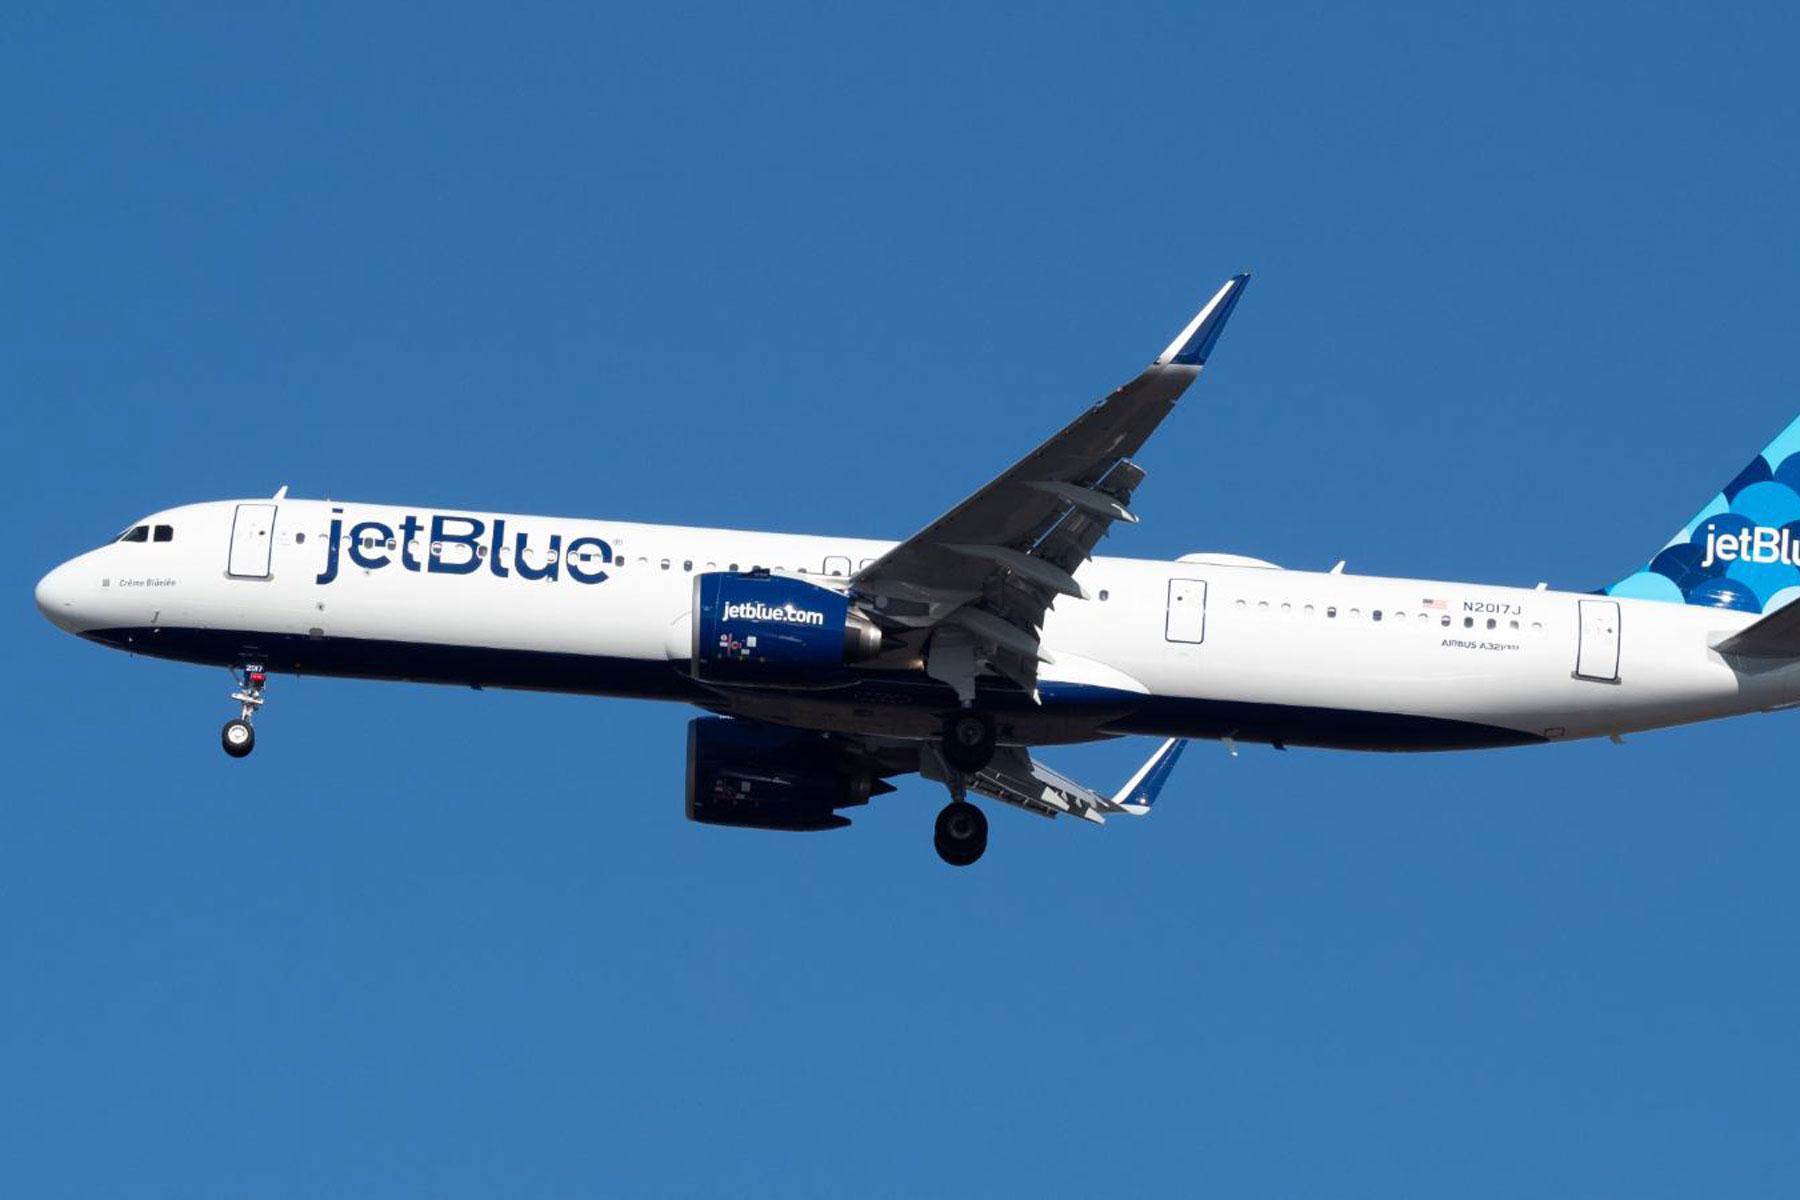 jetblue flight attendants